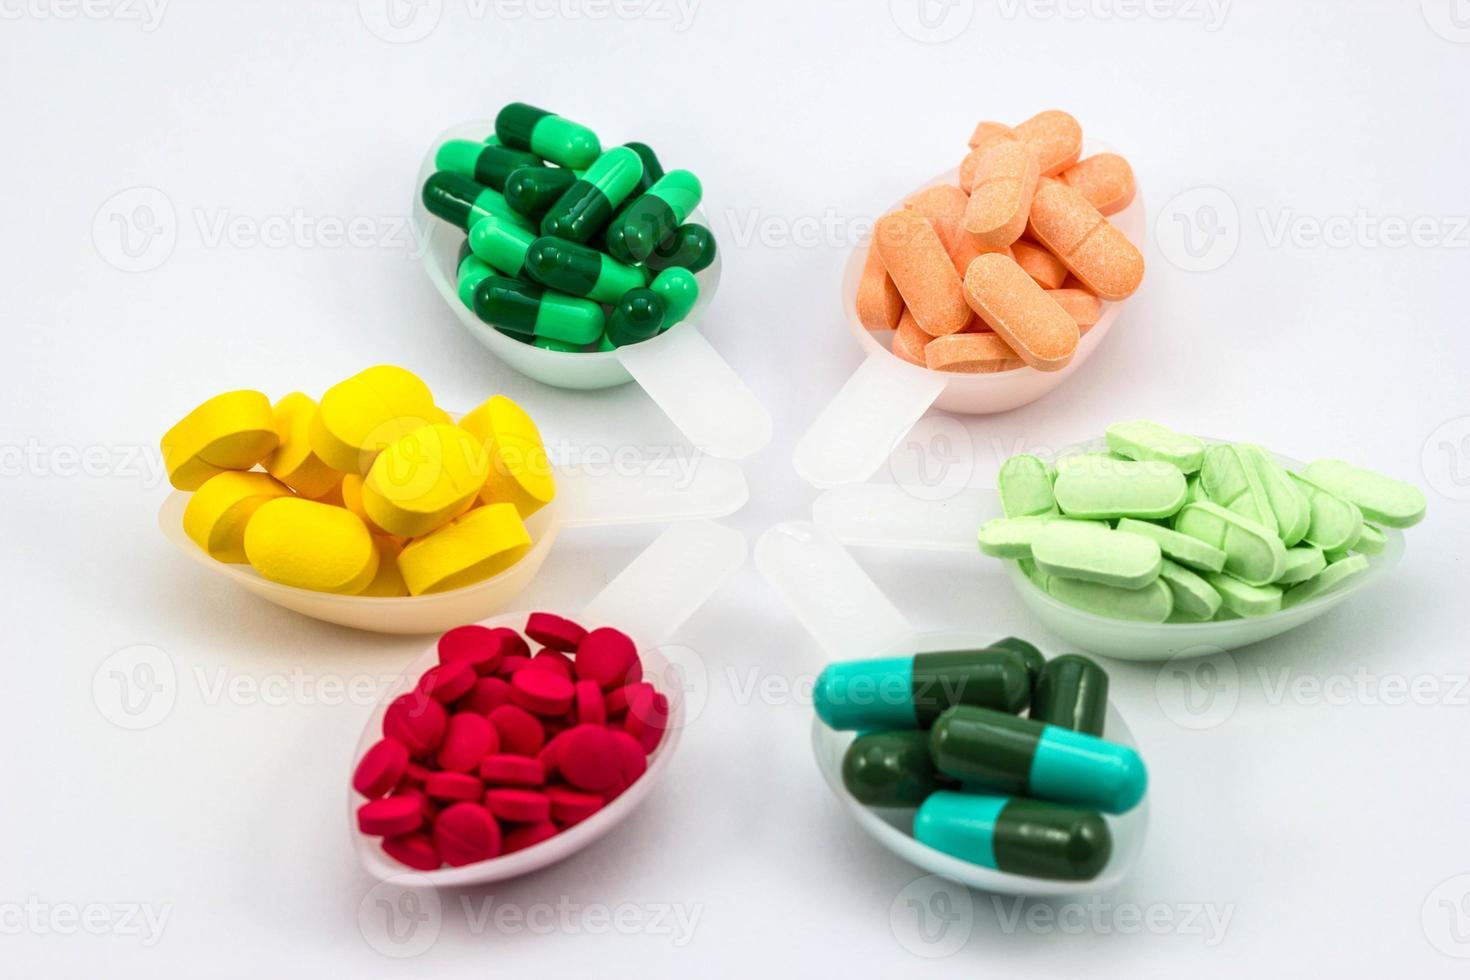 pills in tea spoon on white background photo